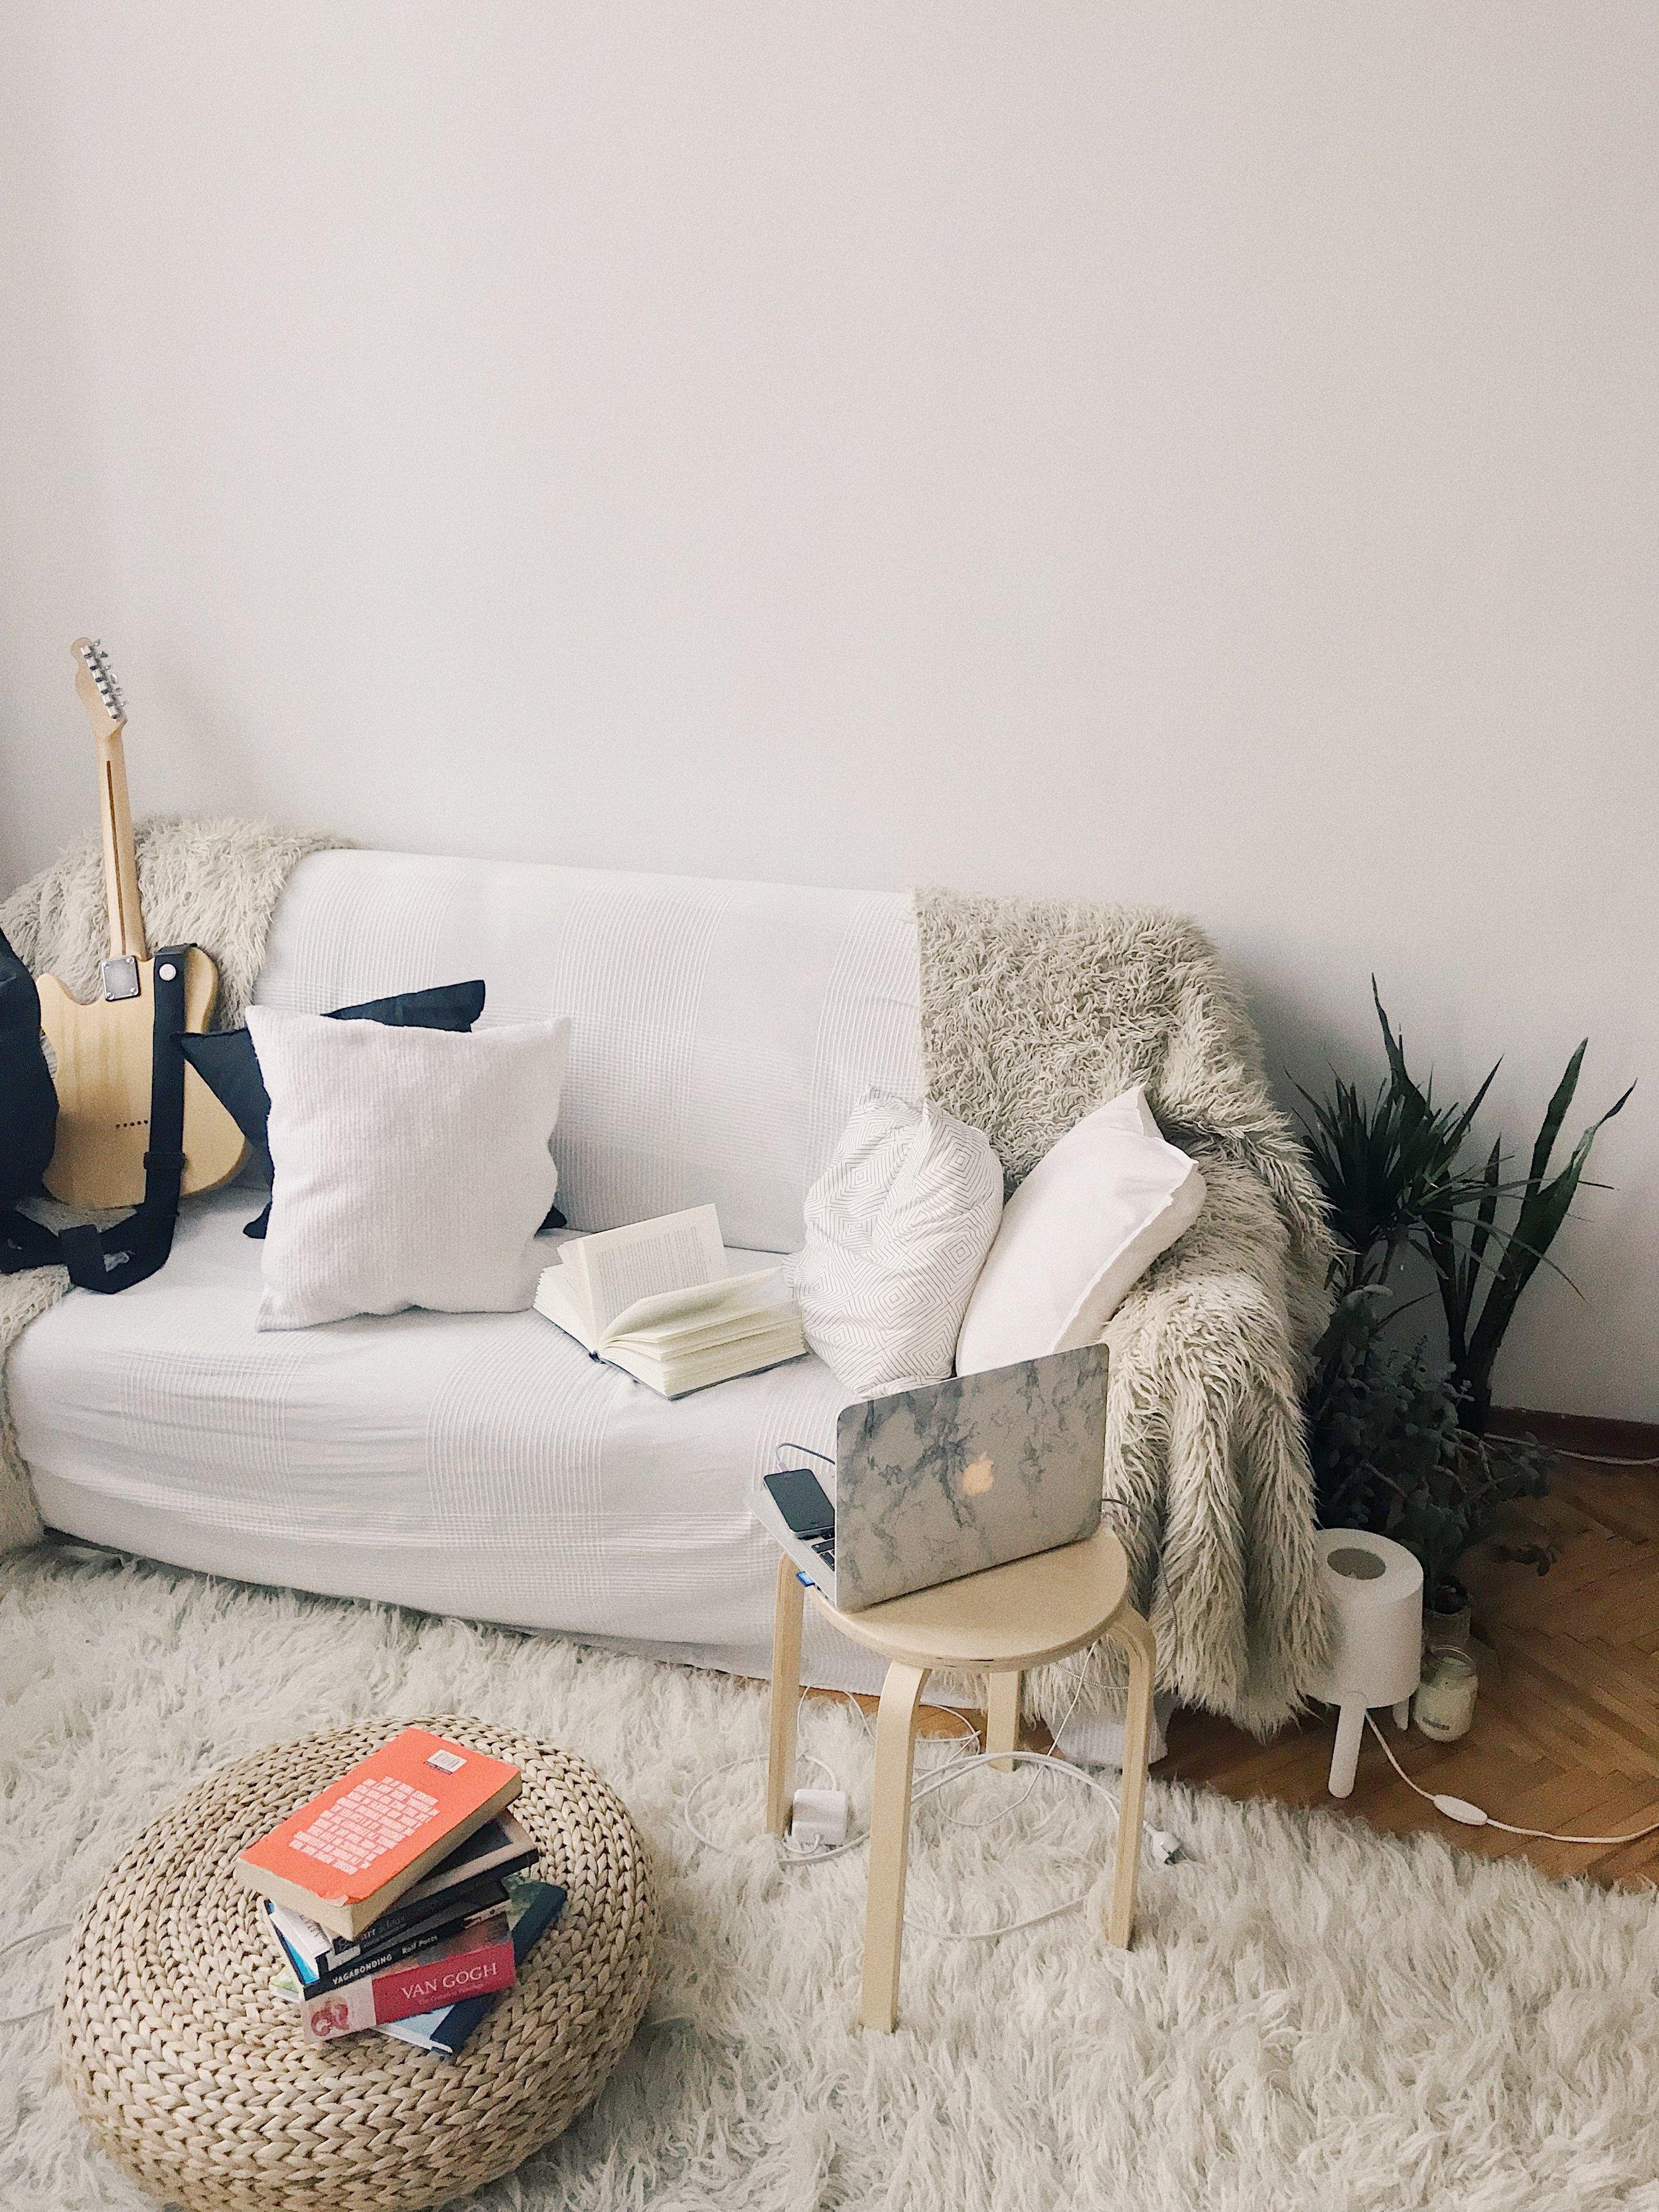 apartment-laptop-guitar-renters-insurance.jpg